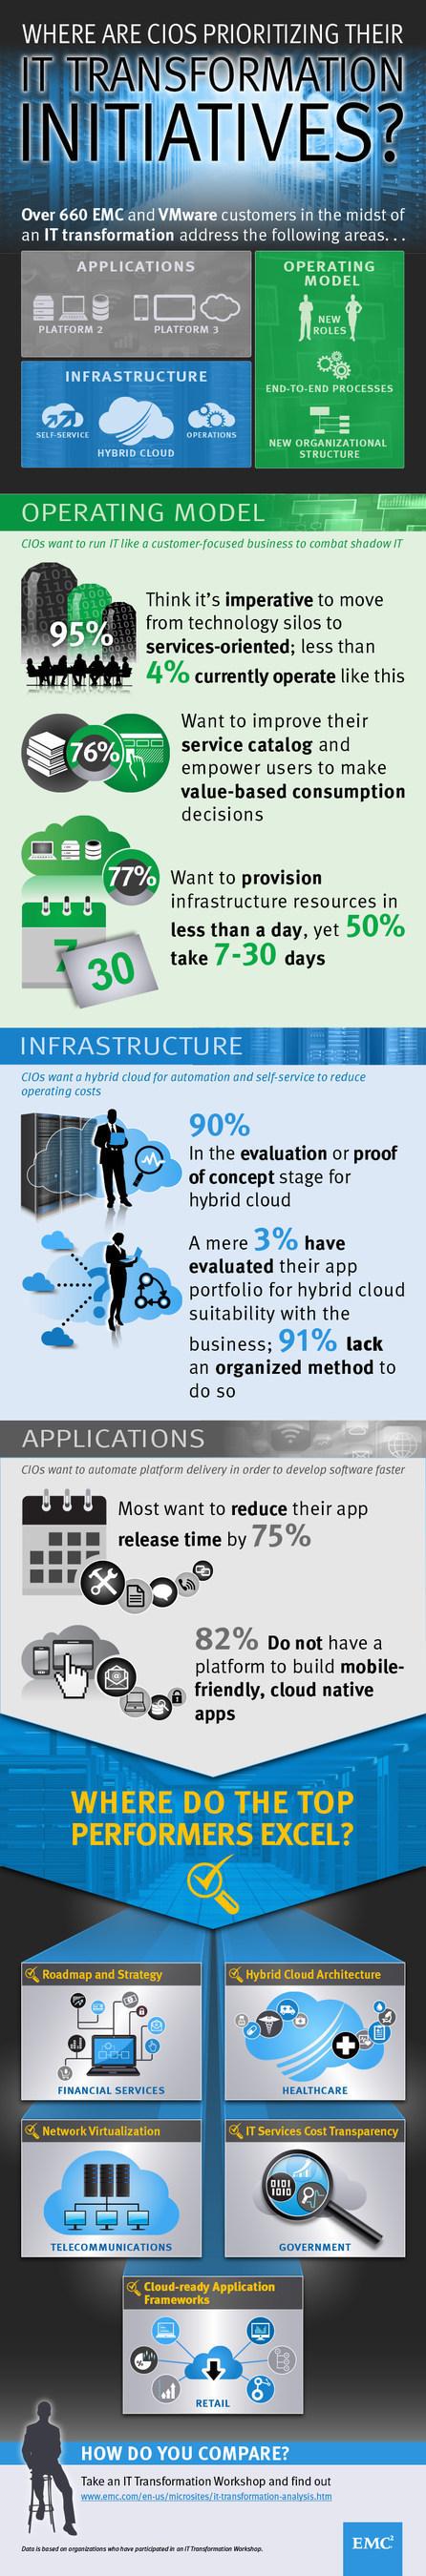 CIOs Prioritize IT Transformation